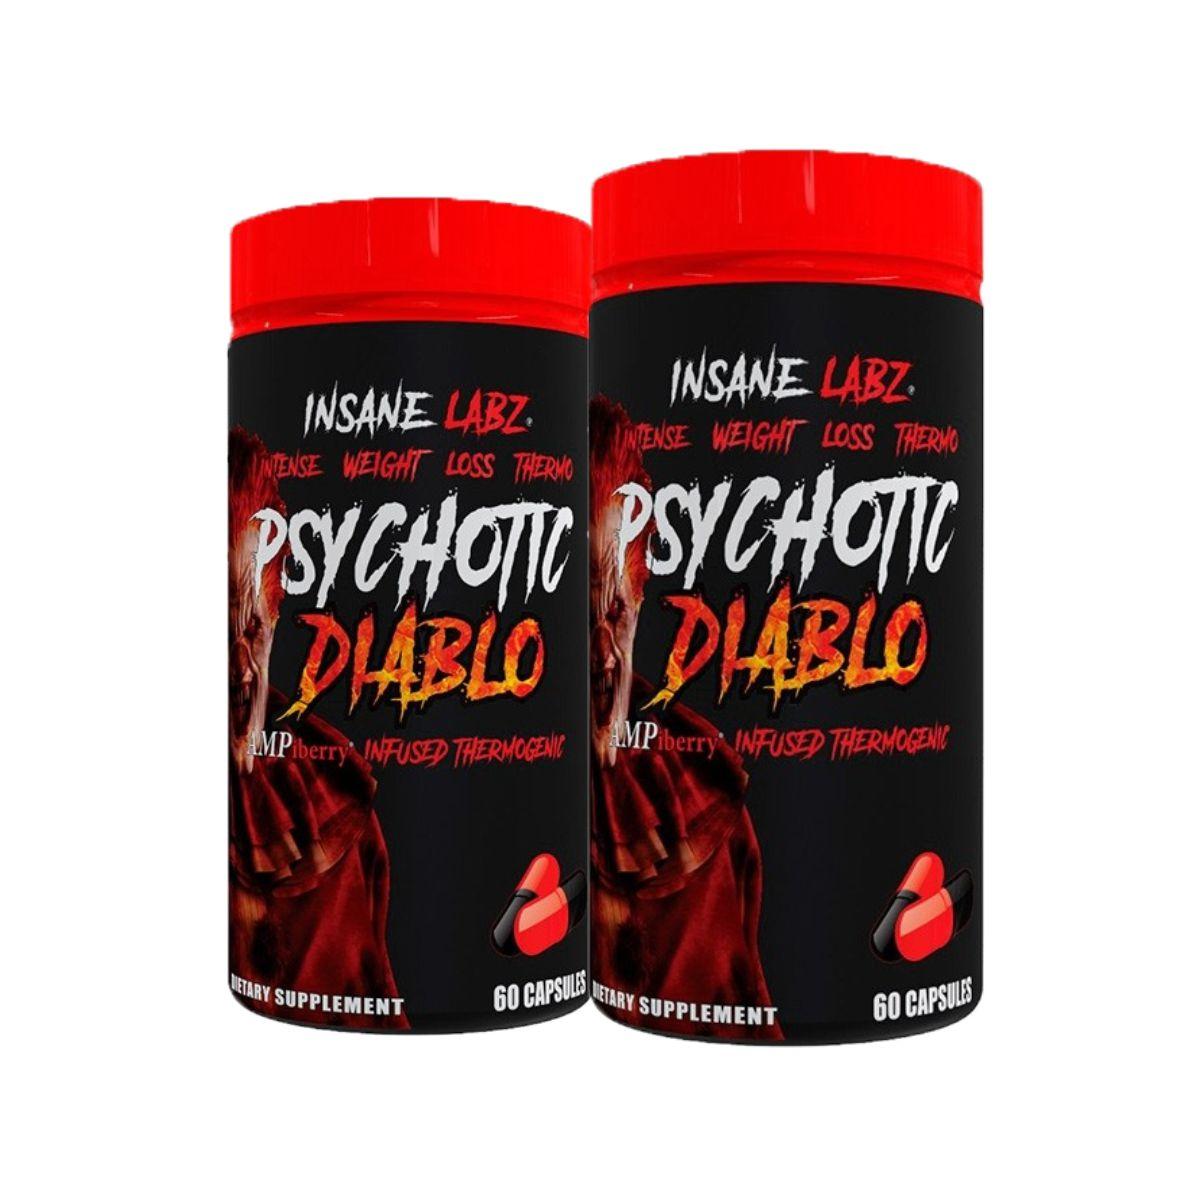 Combo 2 Termogênico Psychotic Diablo 60Caps Importado + Melatonina 3mg - Insane Labz